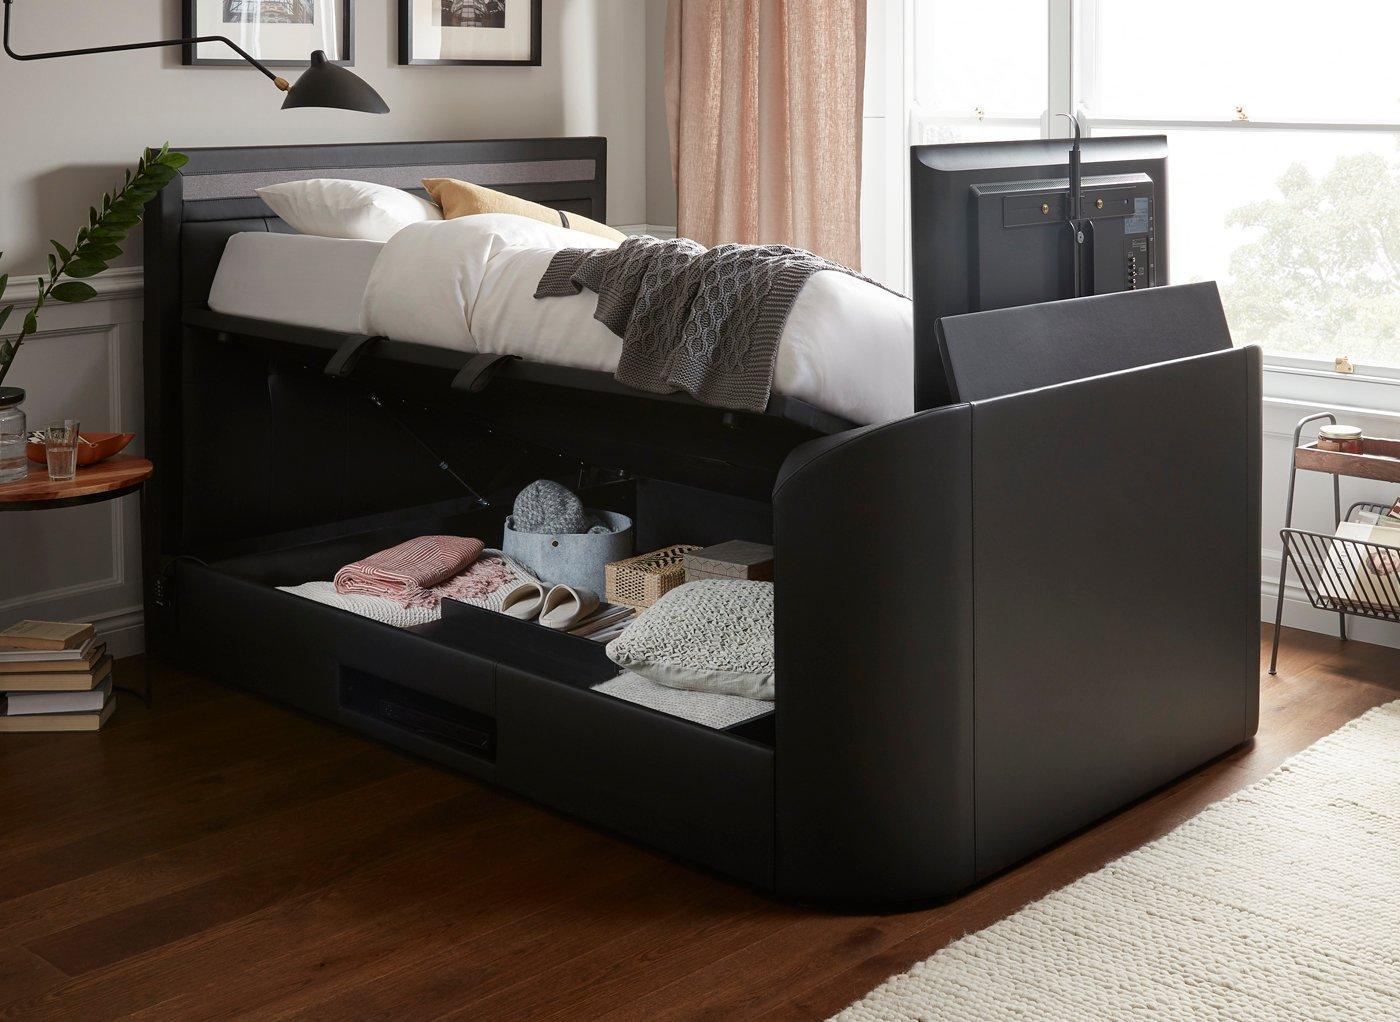 Tokyo K Ottoman Tv/Media Bed Black Leather 5'0 King